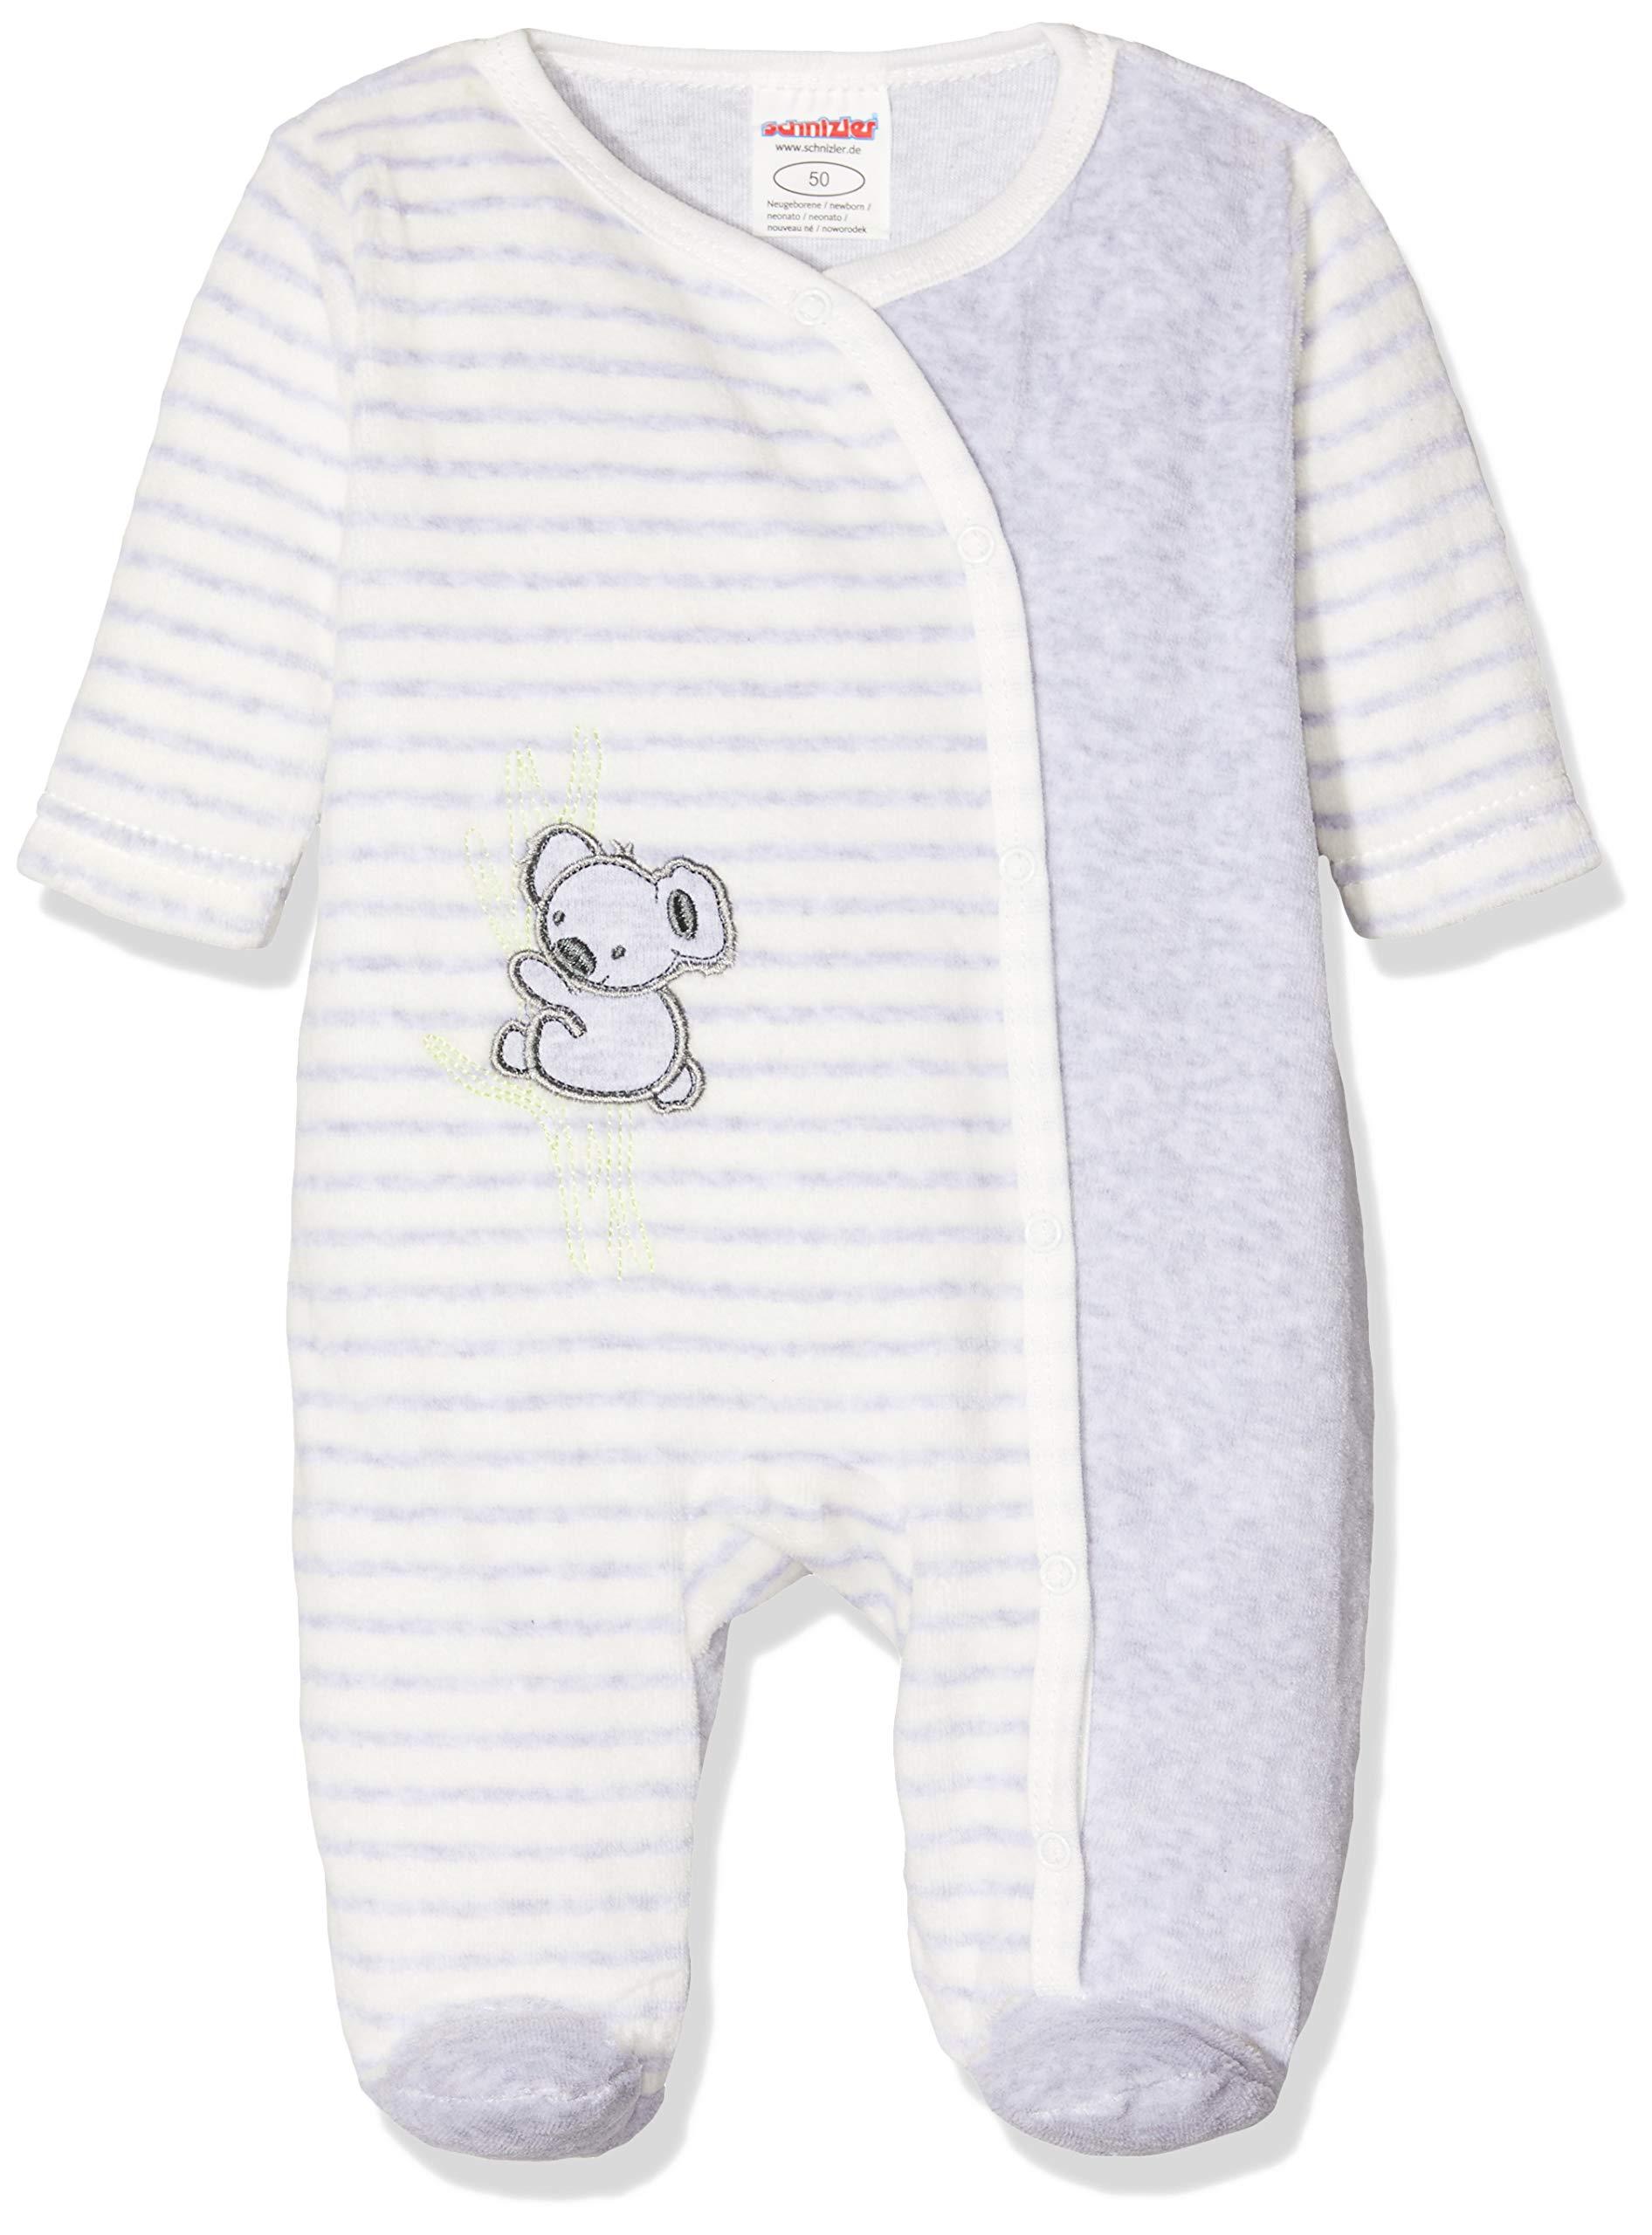 Schnizler Schlafoverall Nicki Ringel Koala Pijama para Bebés 1